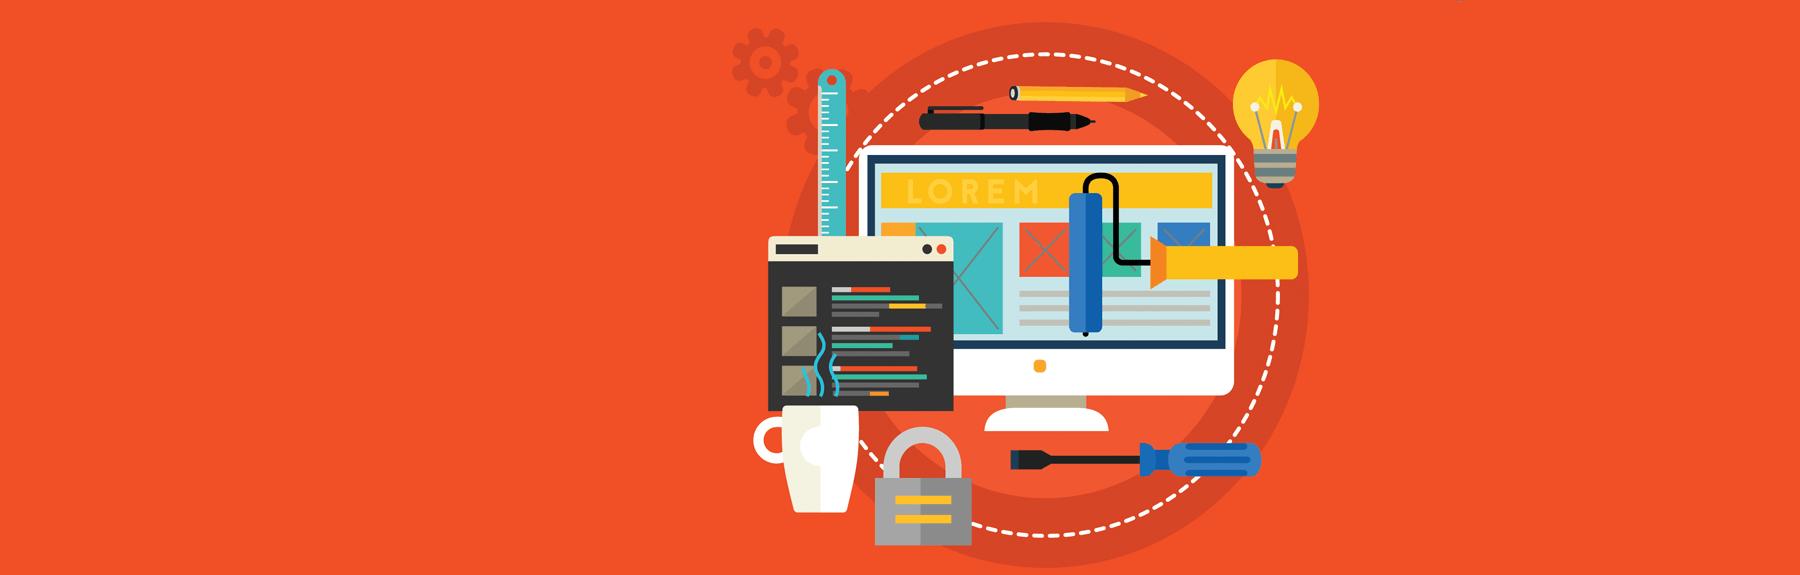 4 quick tips for successful local website design